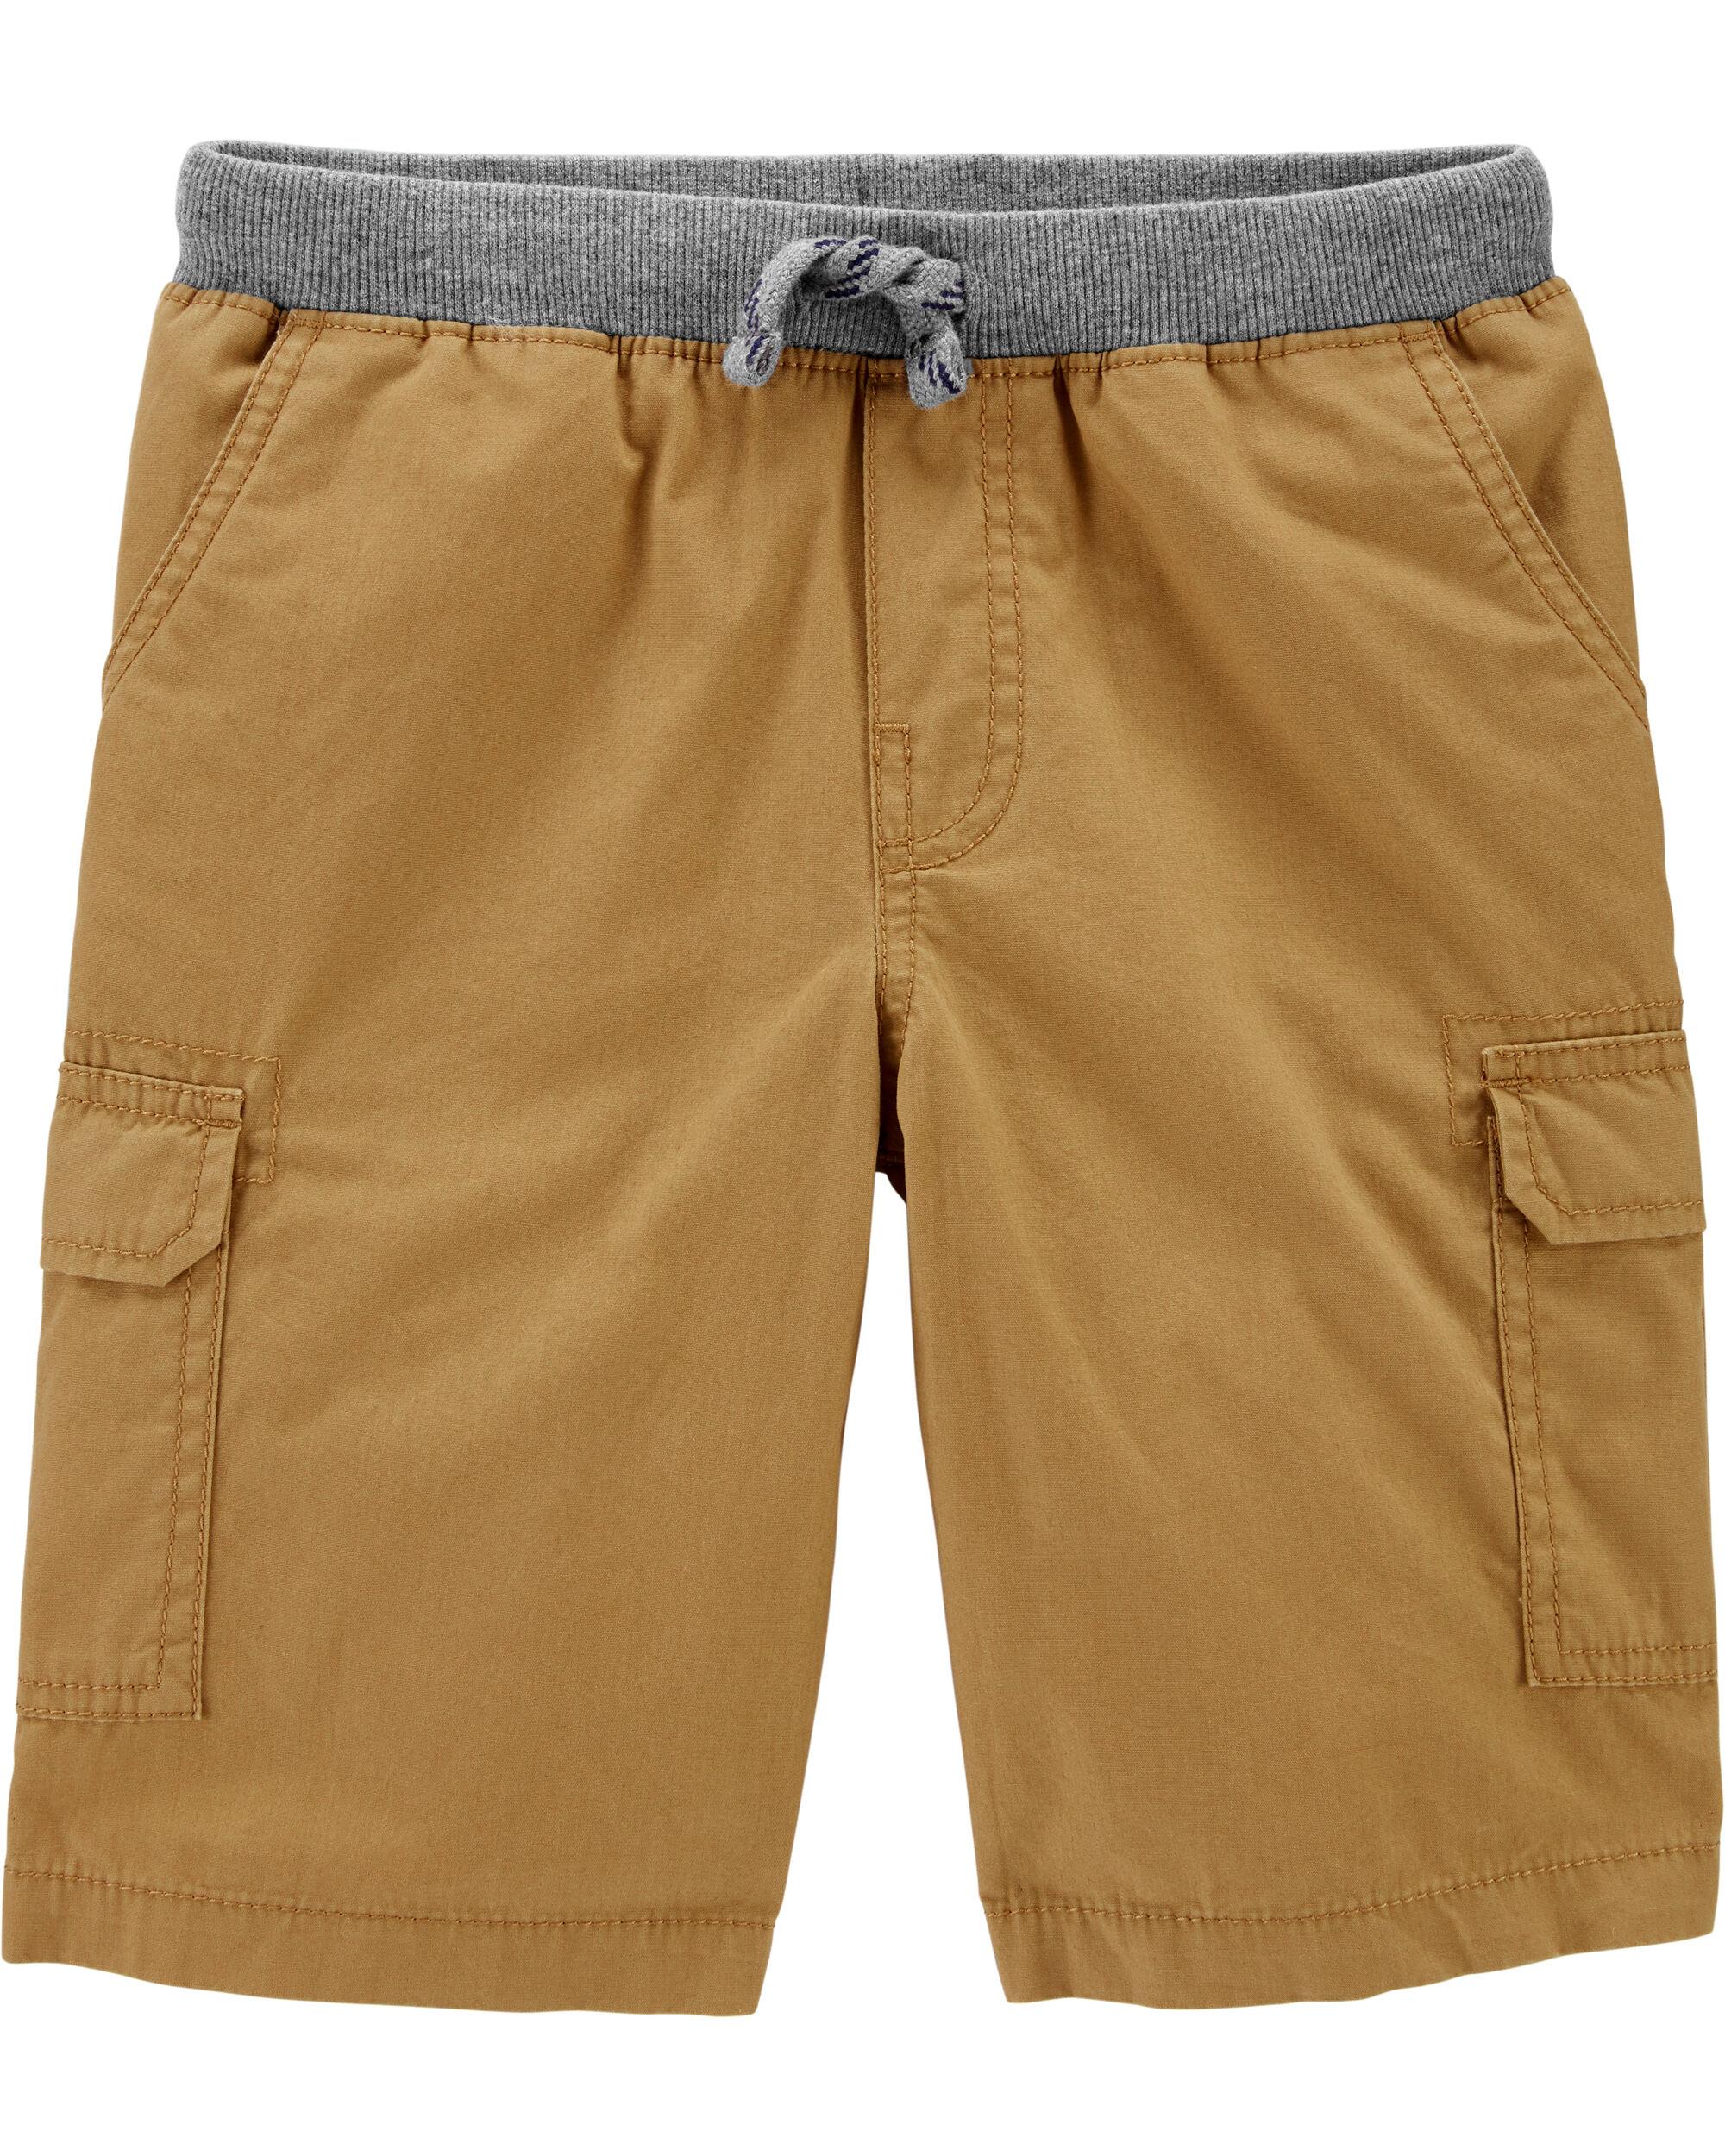 Carters Baby Boys Pull-On Ribbed-Waist Cargo Shorts